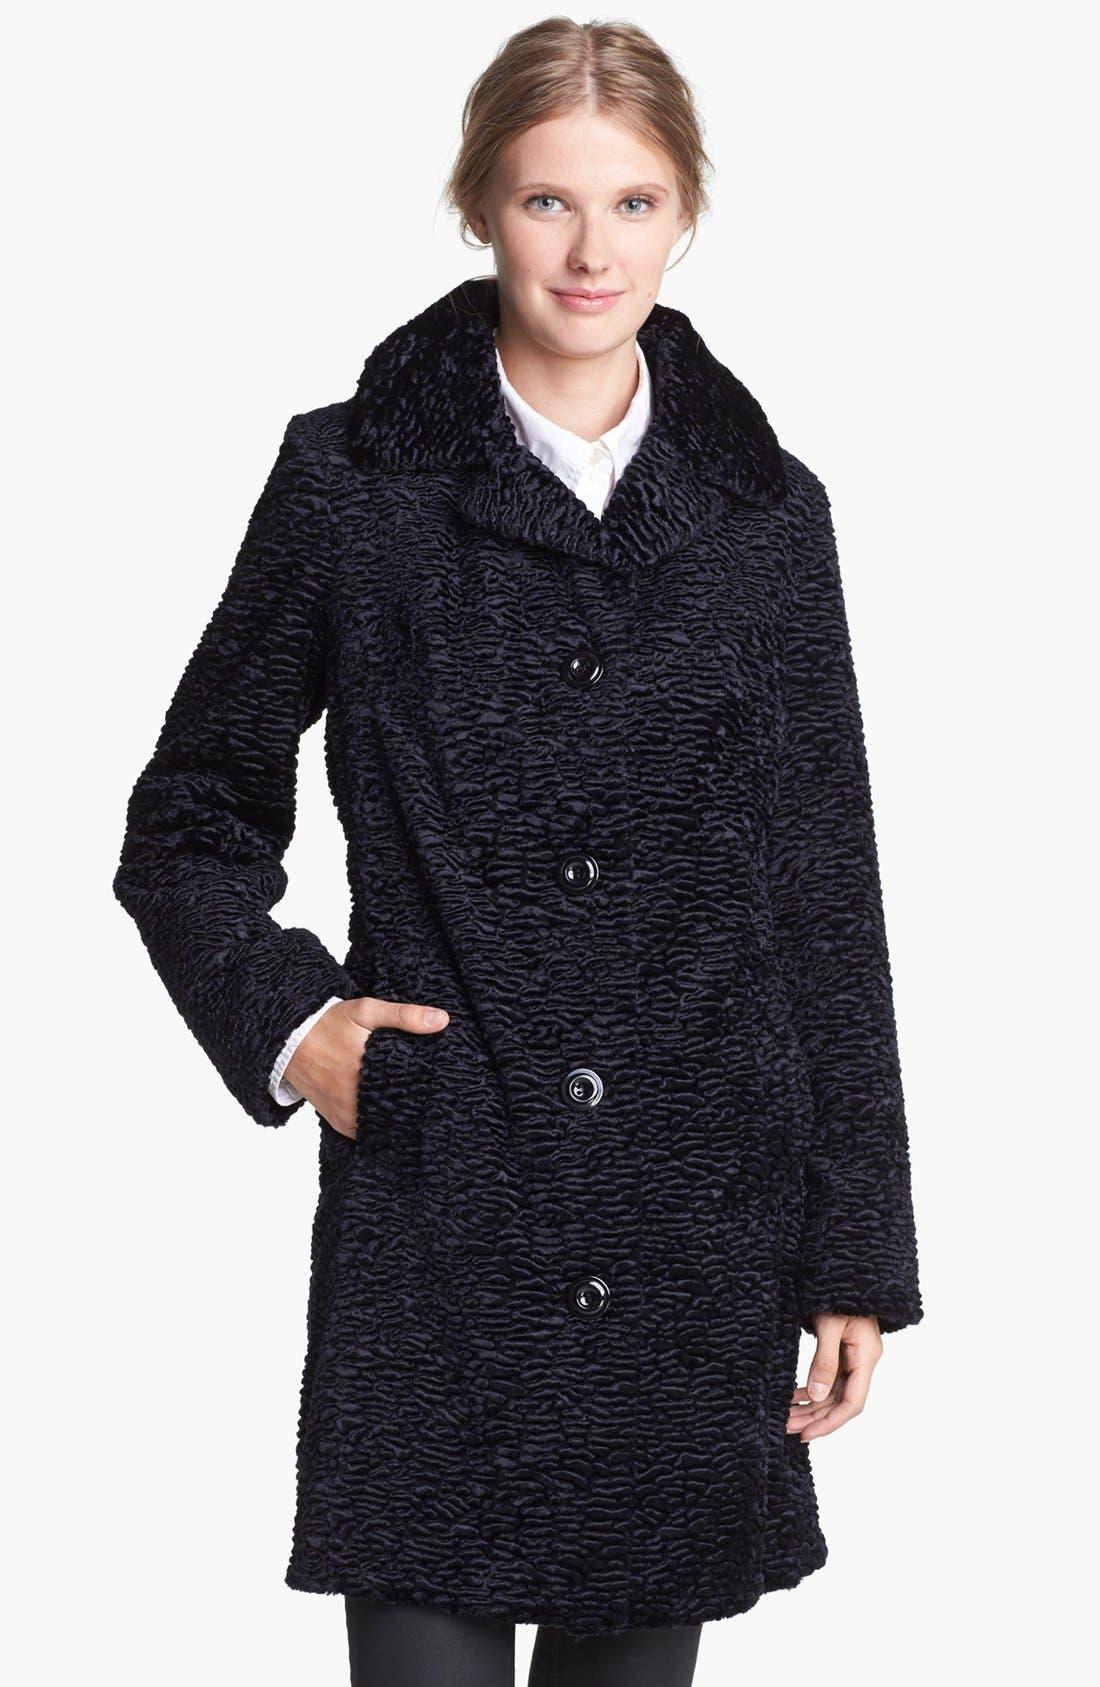 Alternate Image 1 Selected - Gallery Notch Collar Faux Persian Lamb Fur Coat (Regular & Petite)